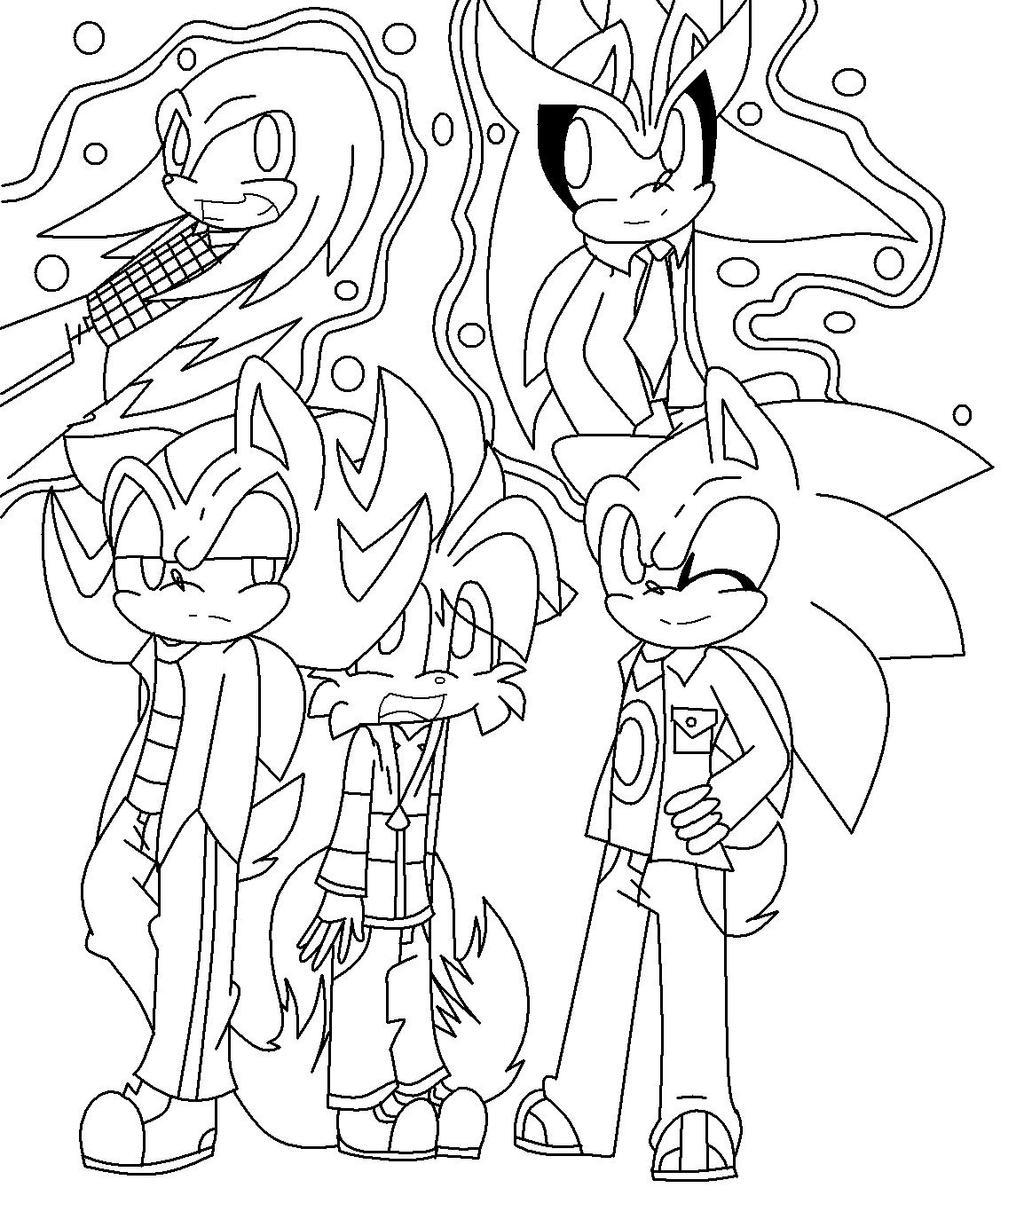 Line Art Creator : Sonic boys line art by mess creator on deviantart